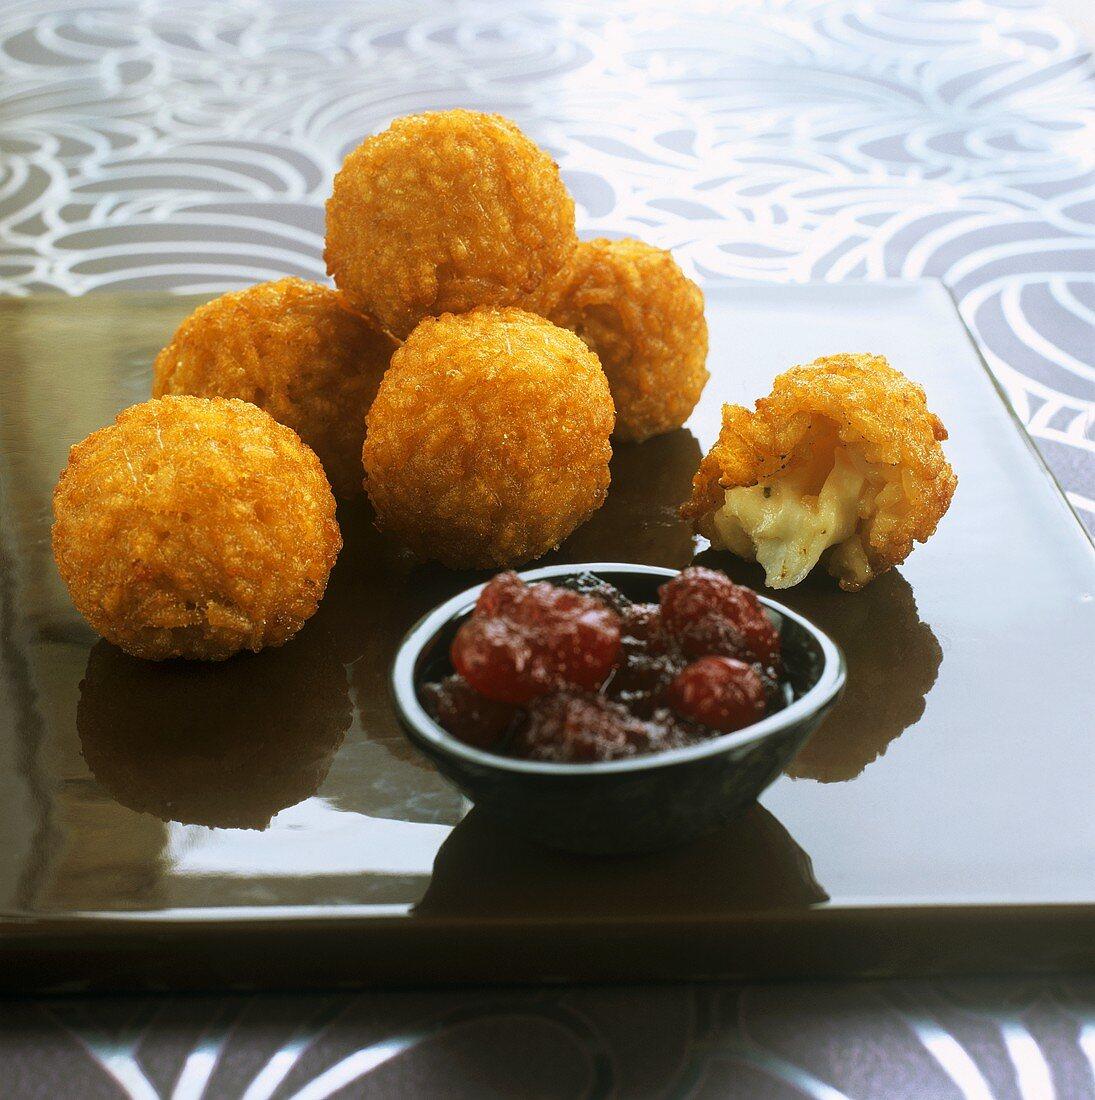 Deep-fried mozzarella risotto balls with cranberry sauce